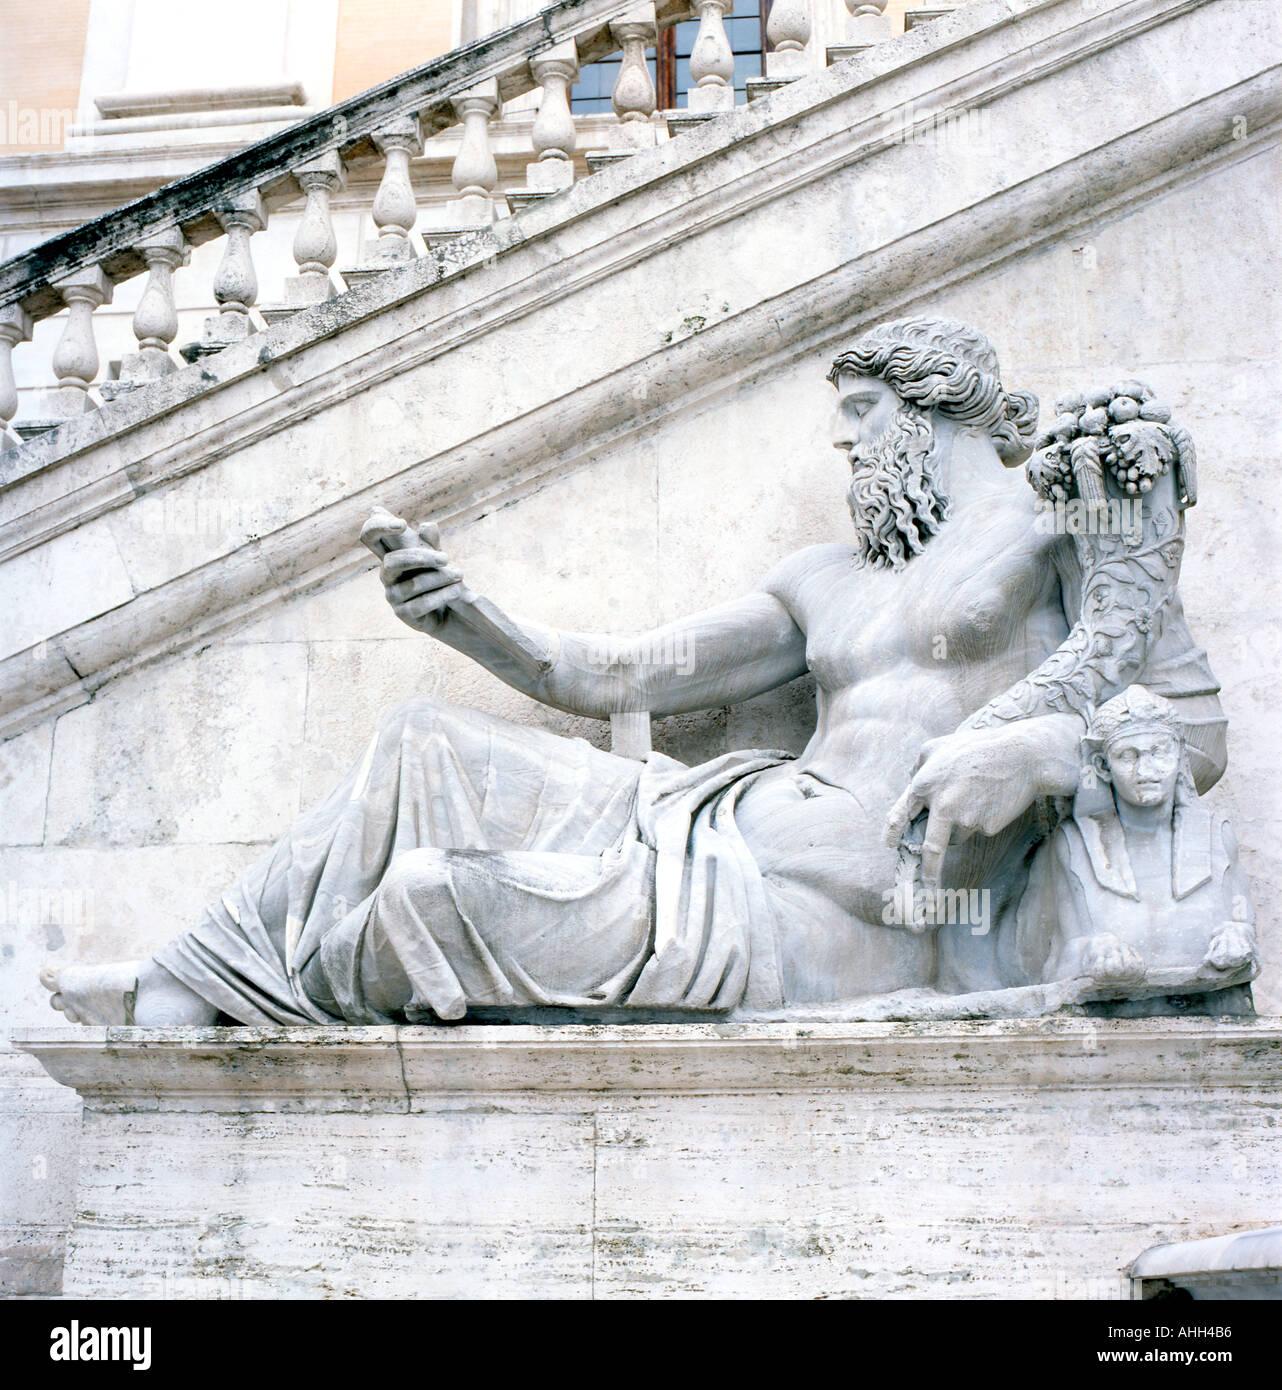 Statue of Zeus  god of thunder on the Capitoline Hill, Palazzo Senatorio, Capitolene Hill in Rome Italy  KATHY DEWITT - Stock Image